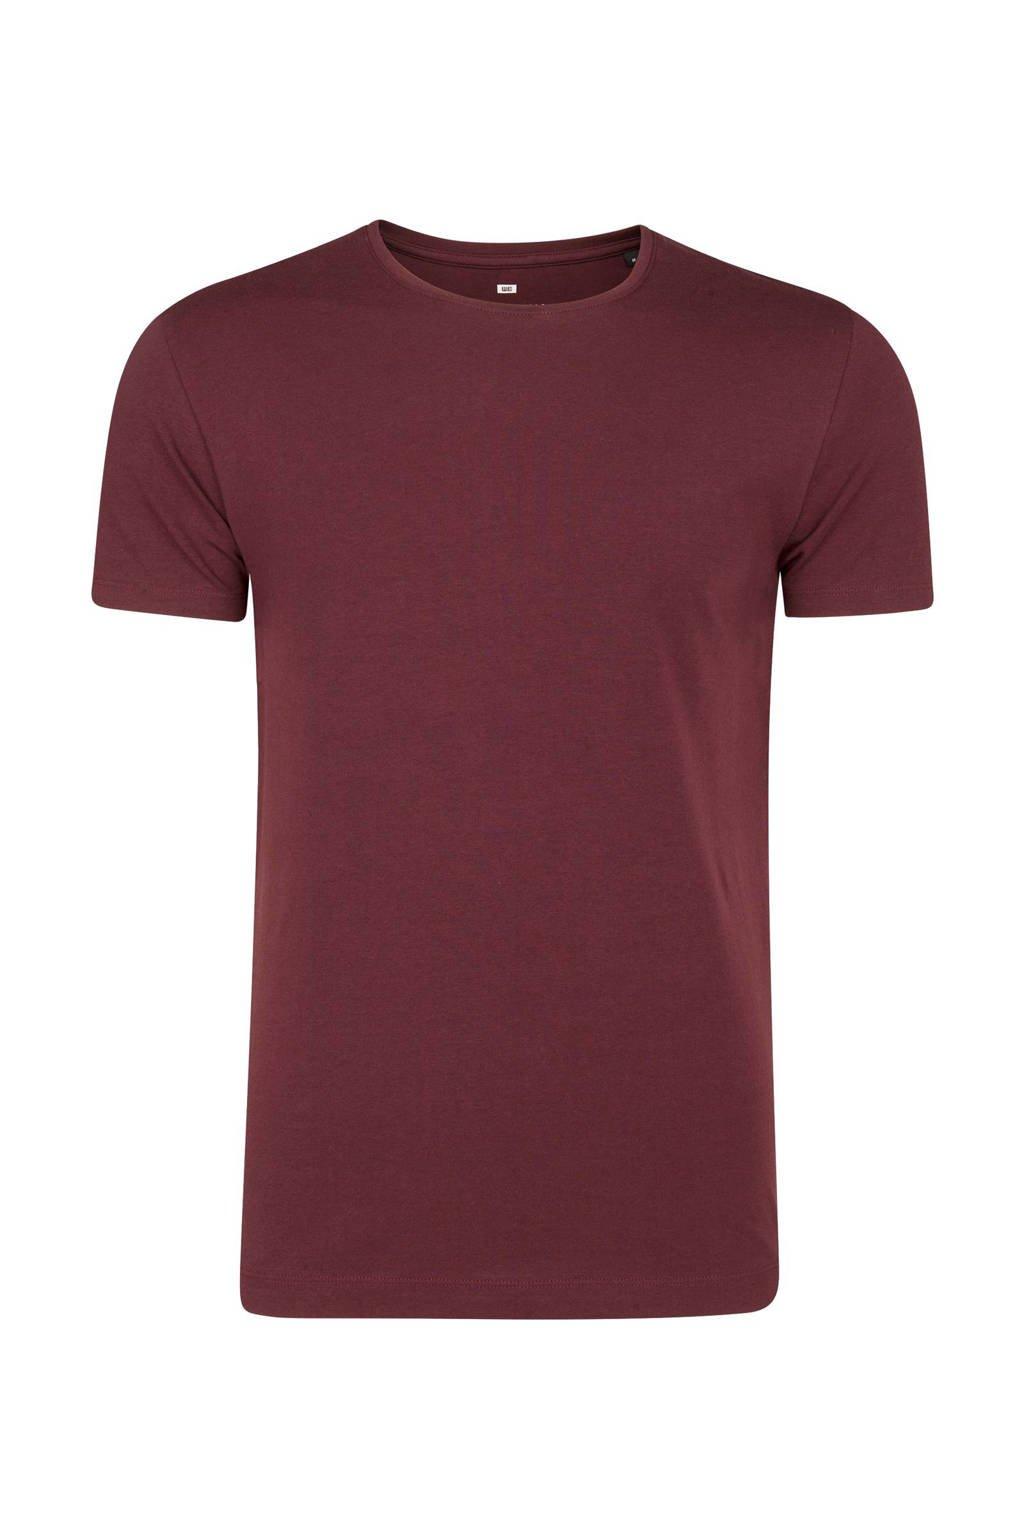 WE Fashion T-shirt, Aubergine